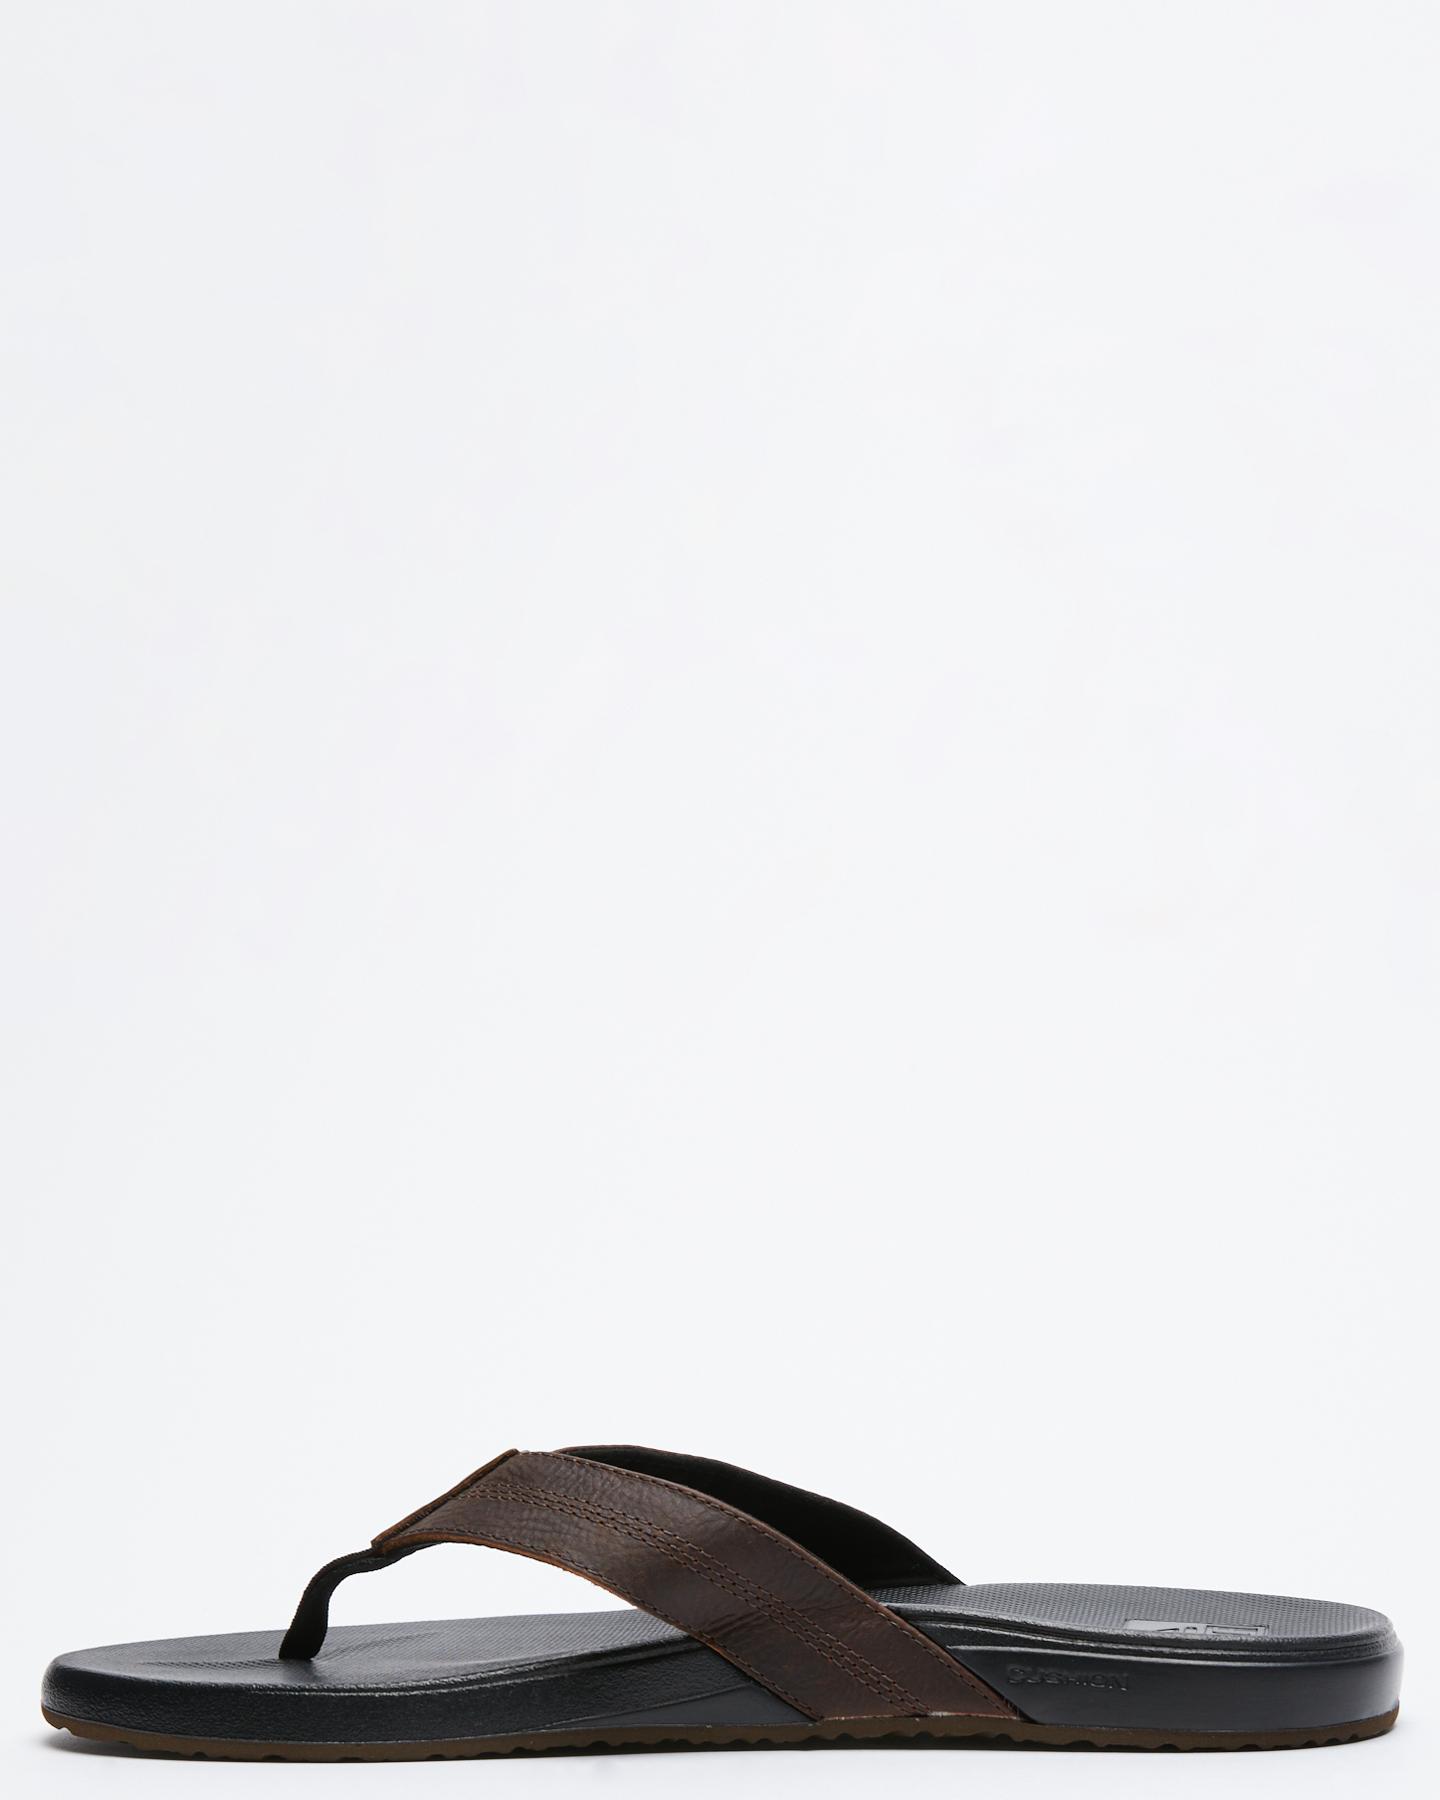 3cc707a326ef7 New Reef Men s Cushion Bounce Phantom Leather Thong Rubber Black